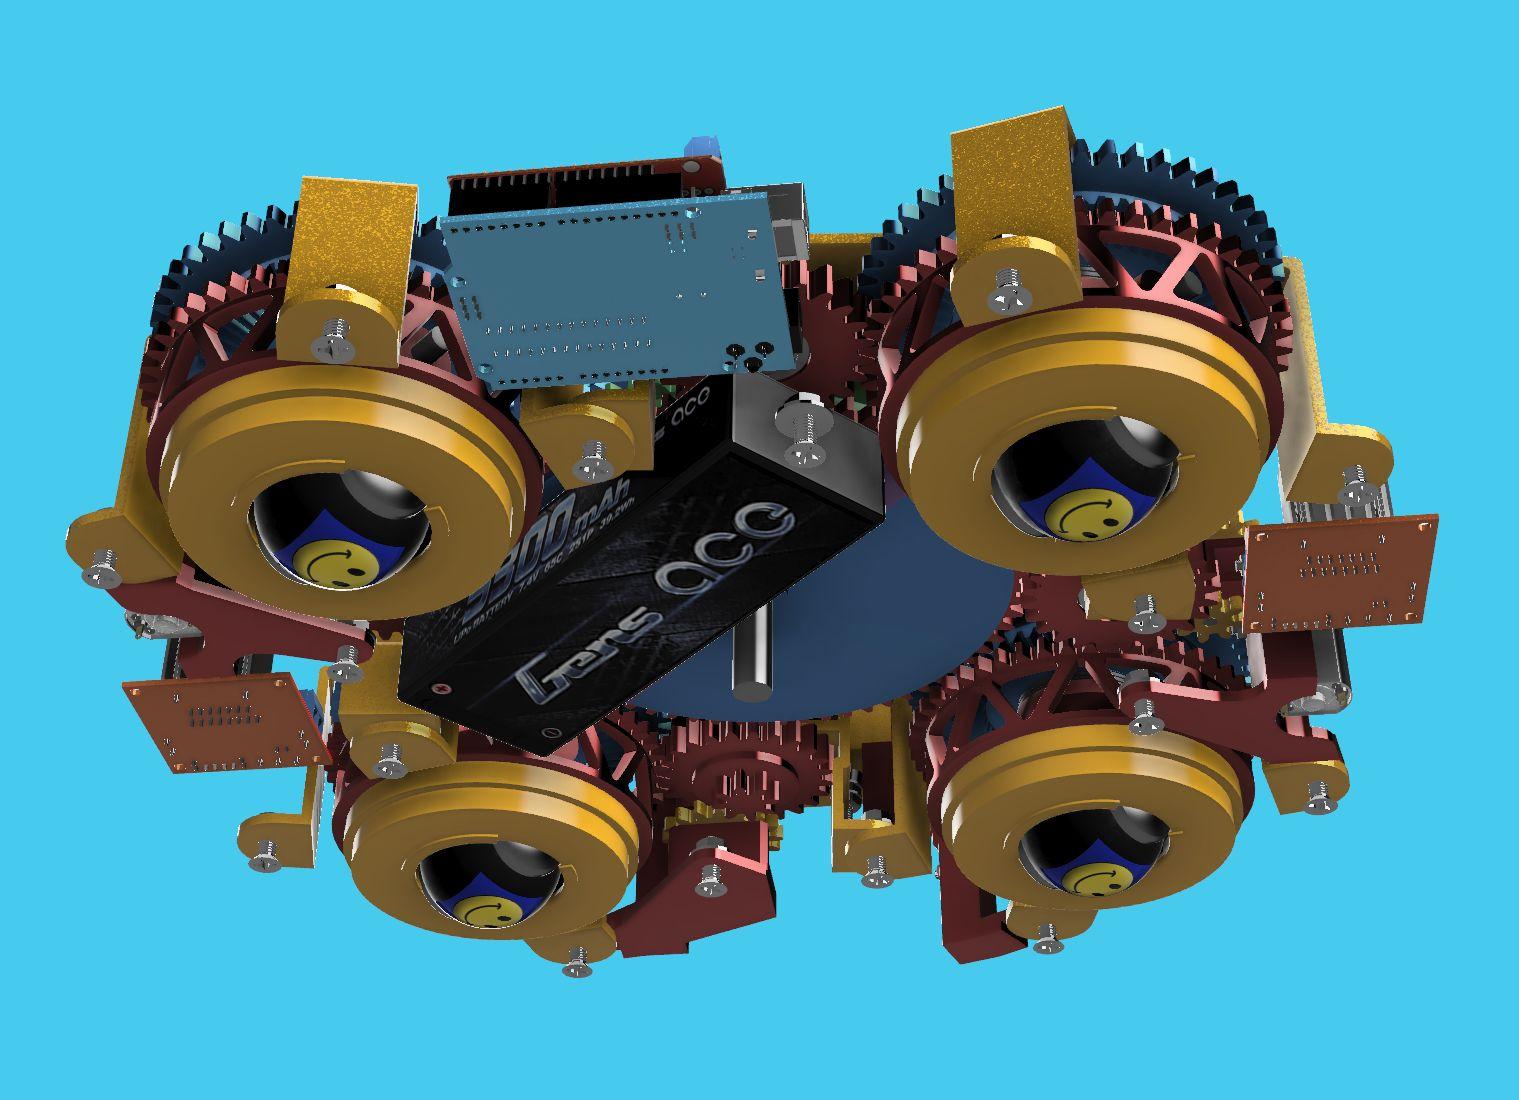 Robocombo-mod4-v8-3500-3500